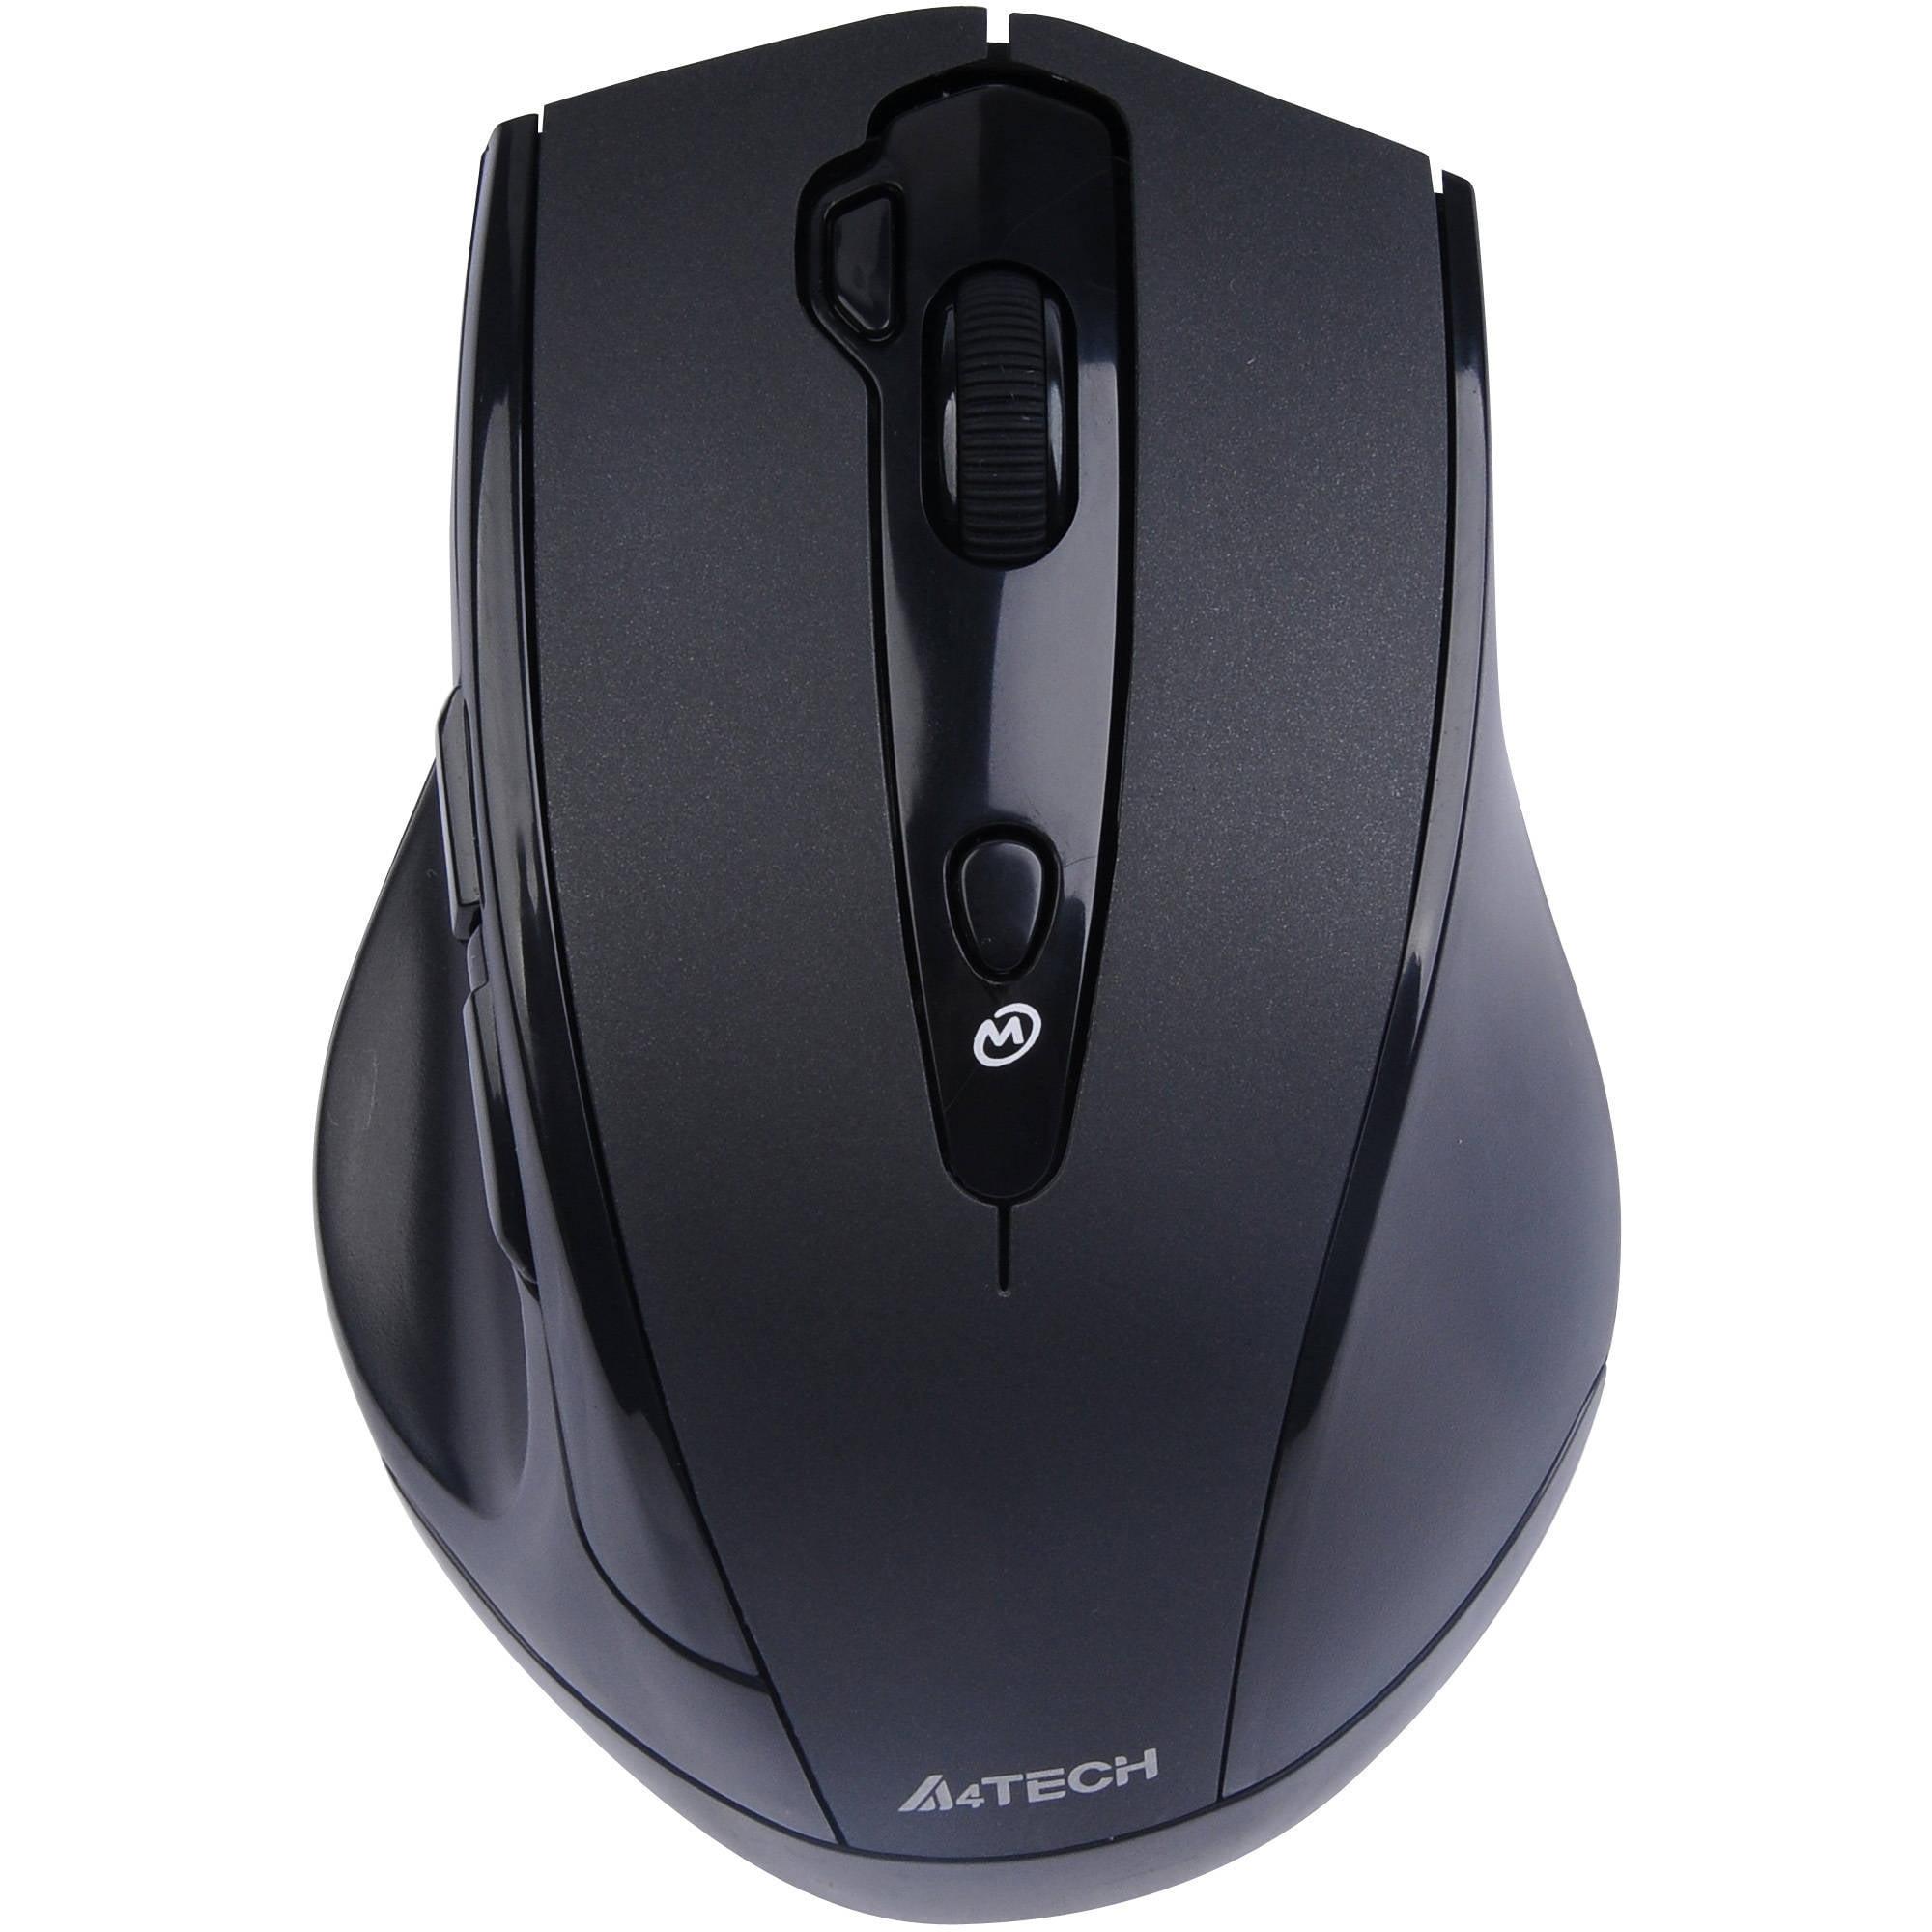 Image of A4tech G10 G10-810F V-Track Wireless Mouse, Black